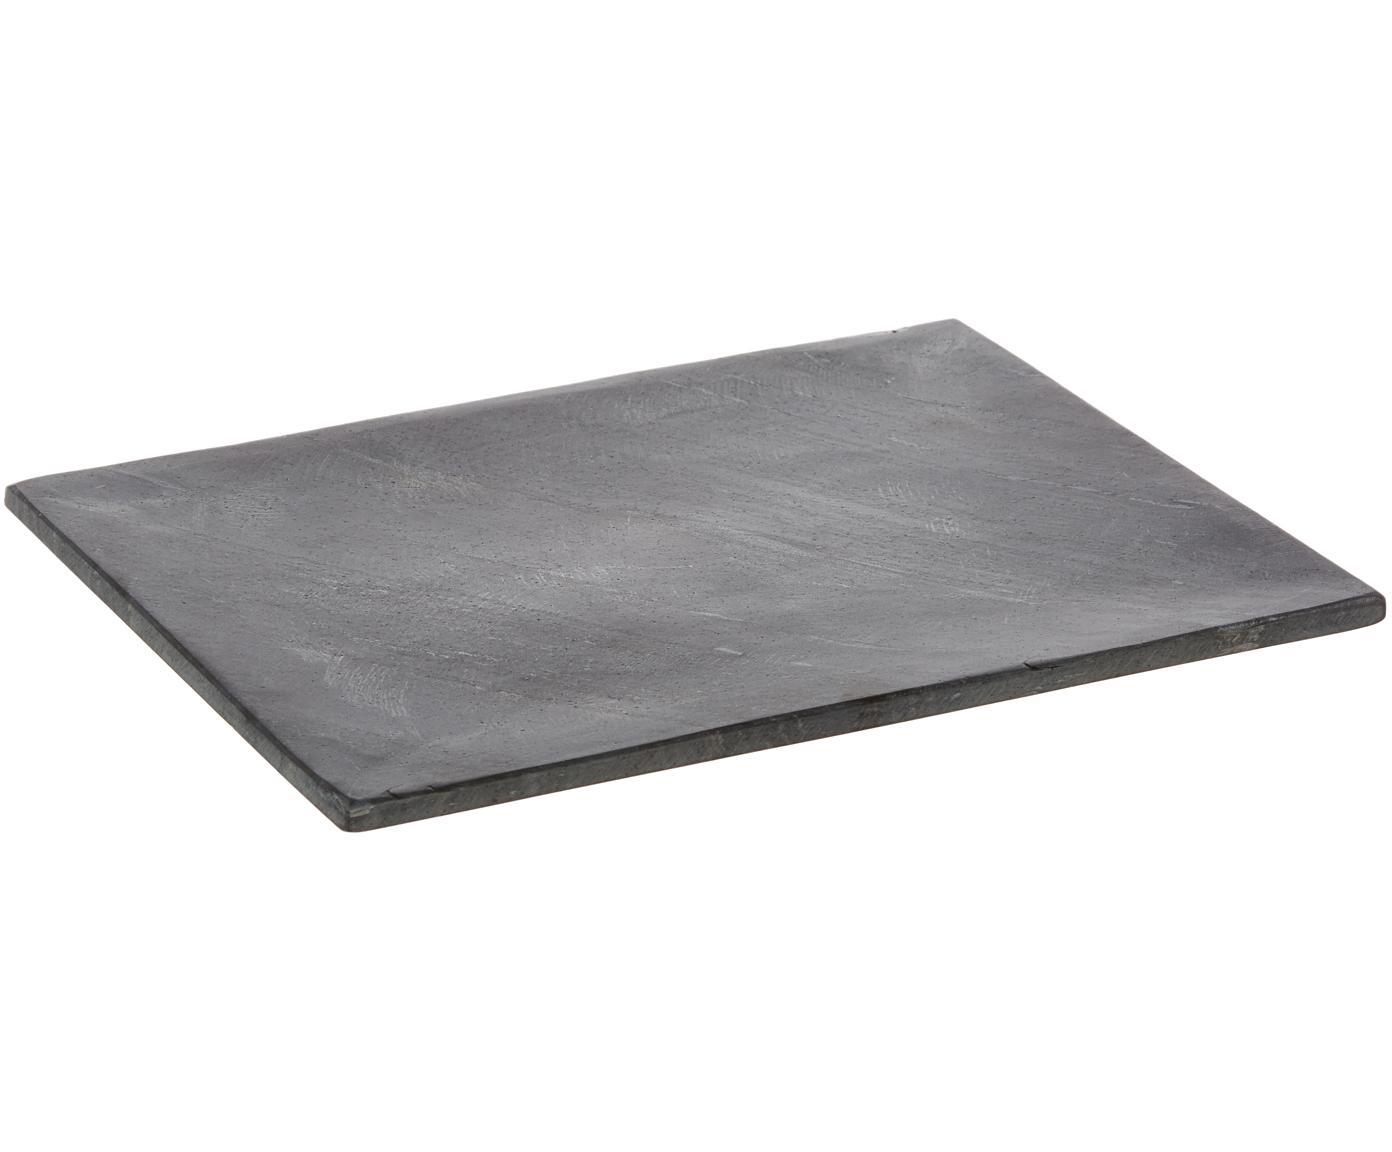 Półmisek z granitu Klevina, Granit, Szary, S 28 x W 2 cm